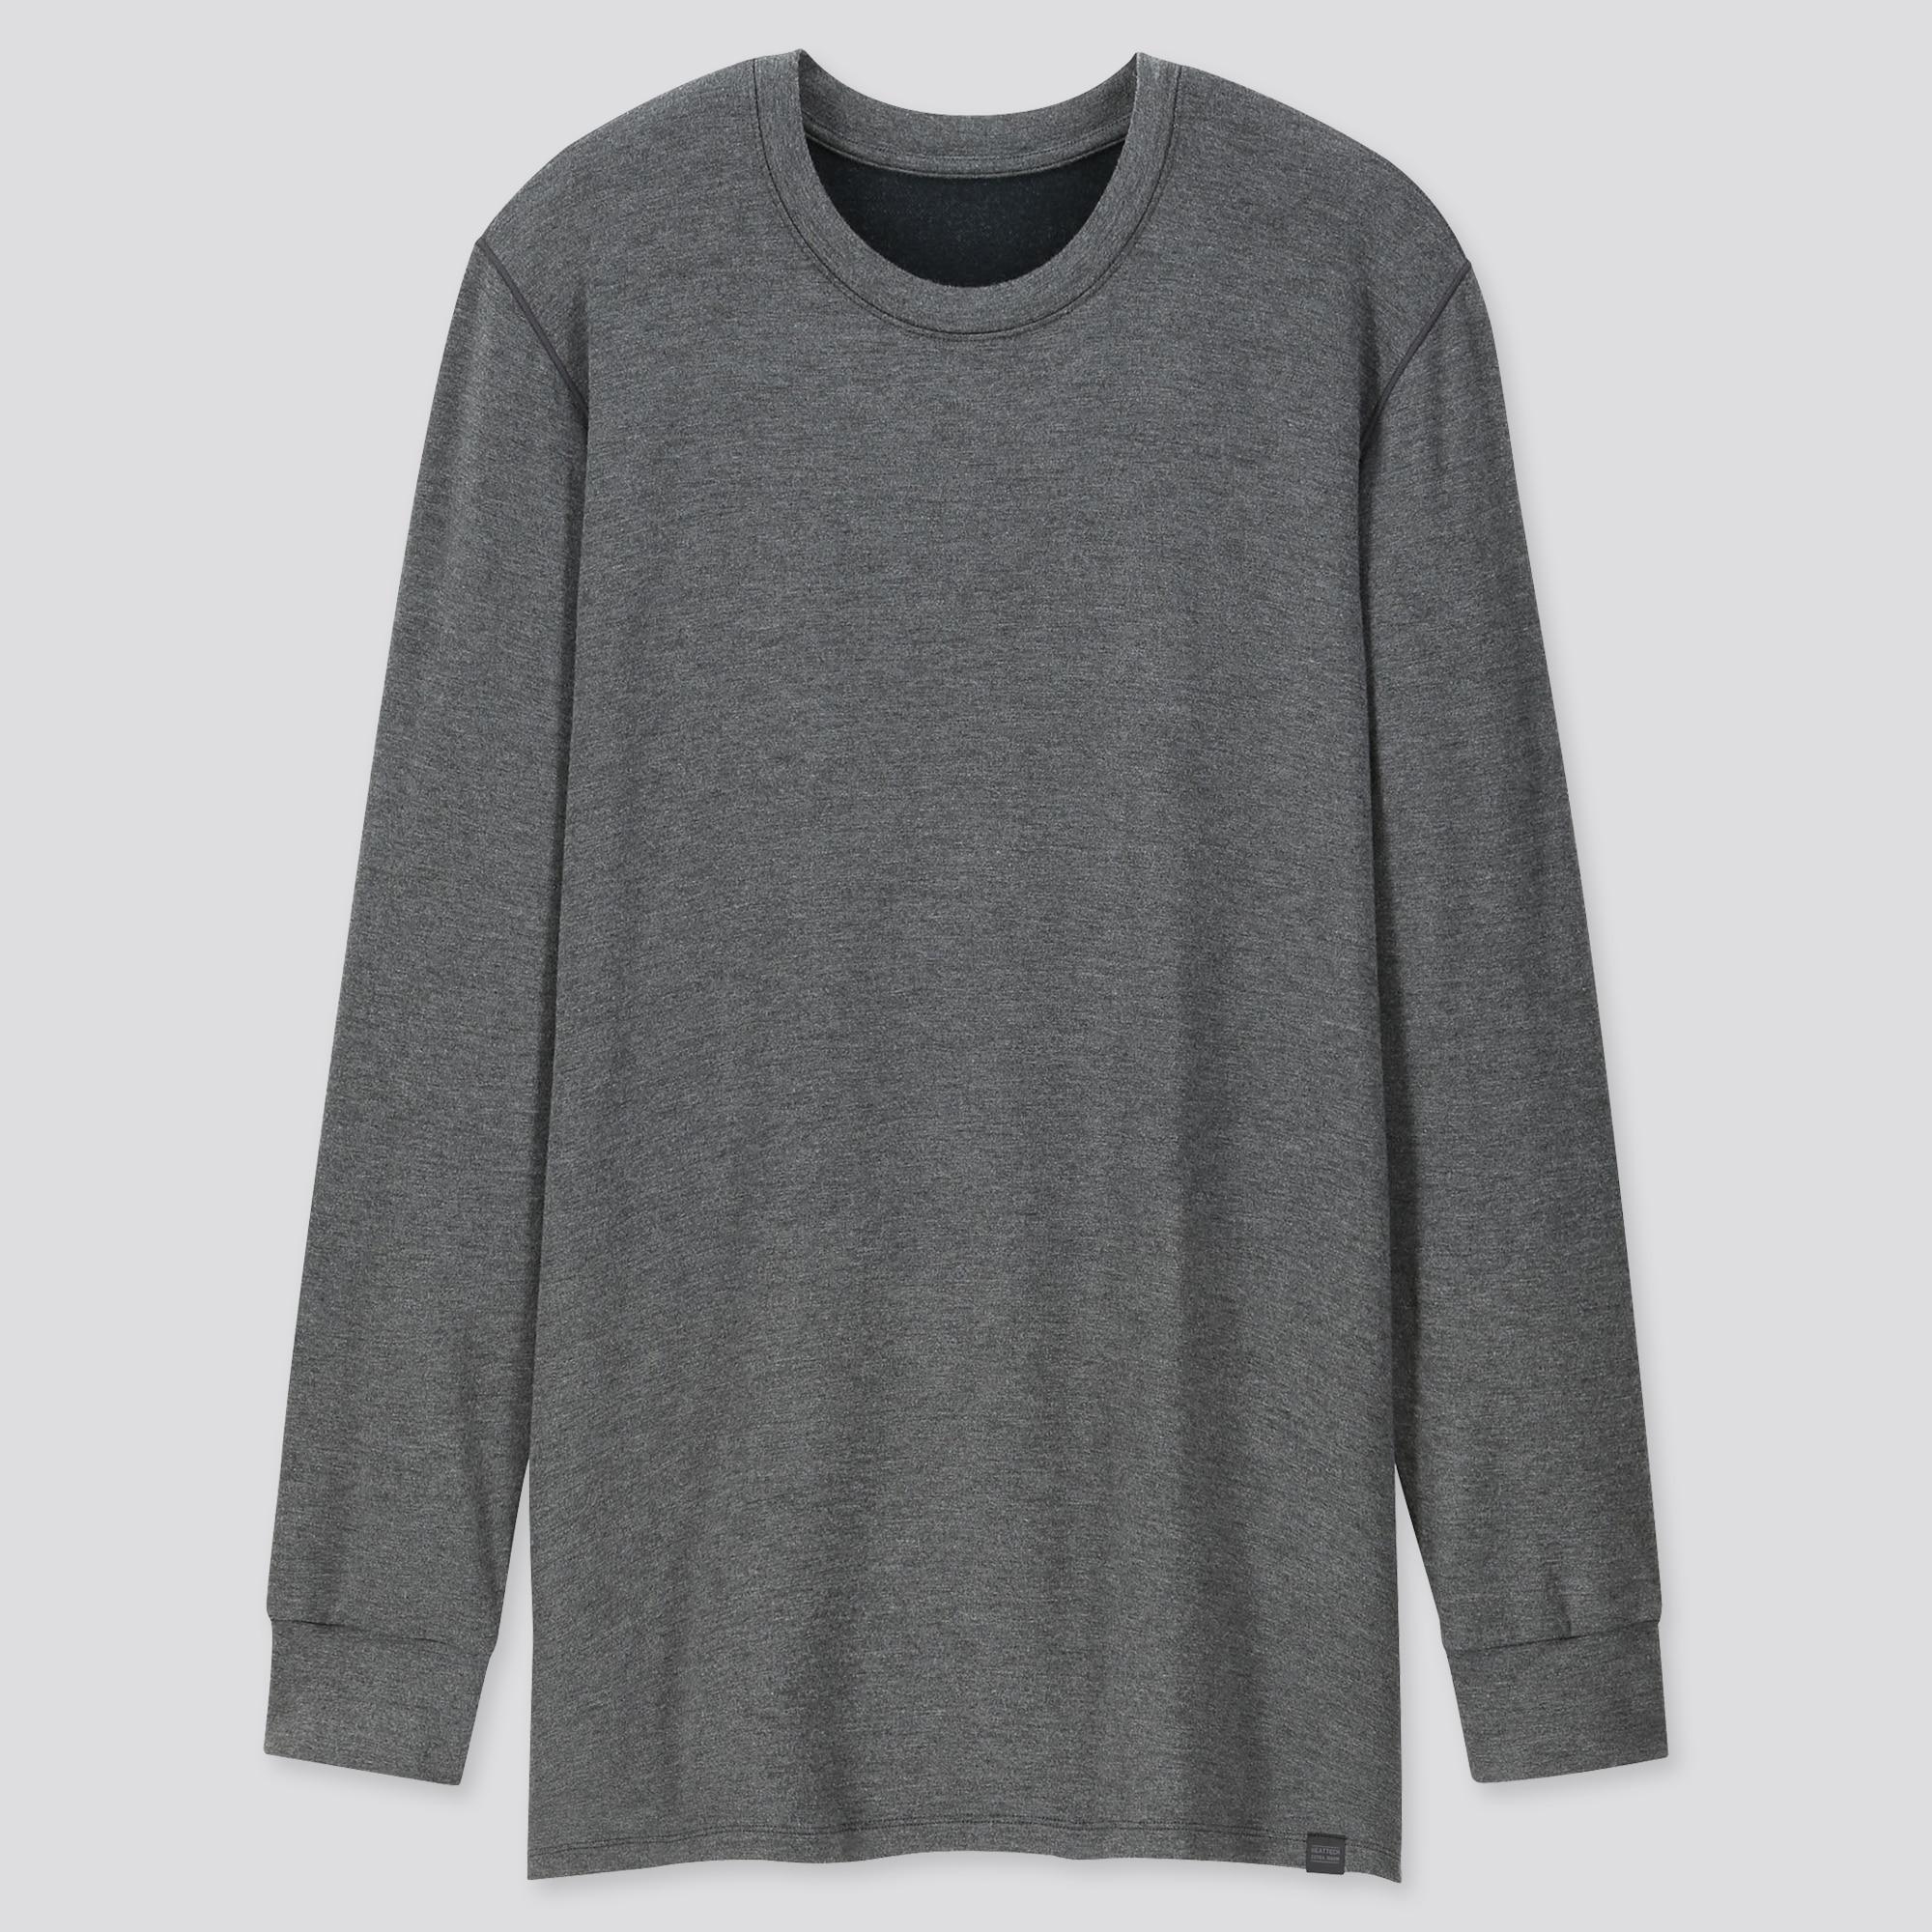 Uniqlo Uniqlo men heattech extra warm crew neck long-sleeve t-shirt